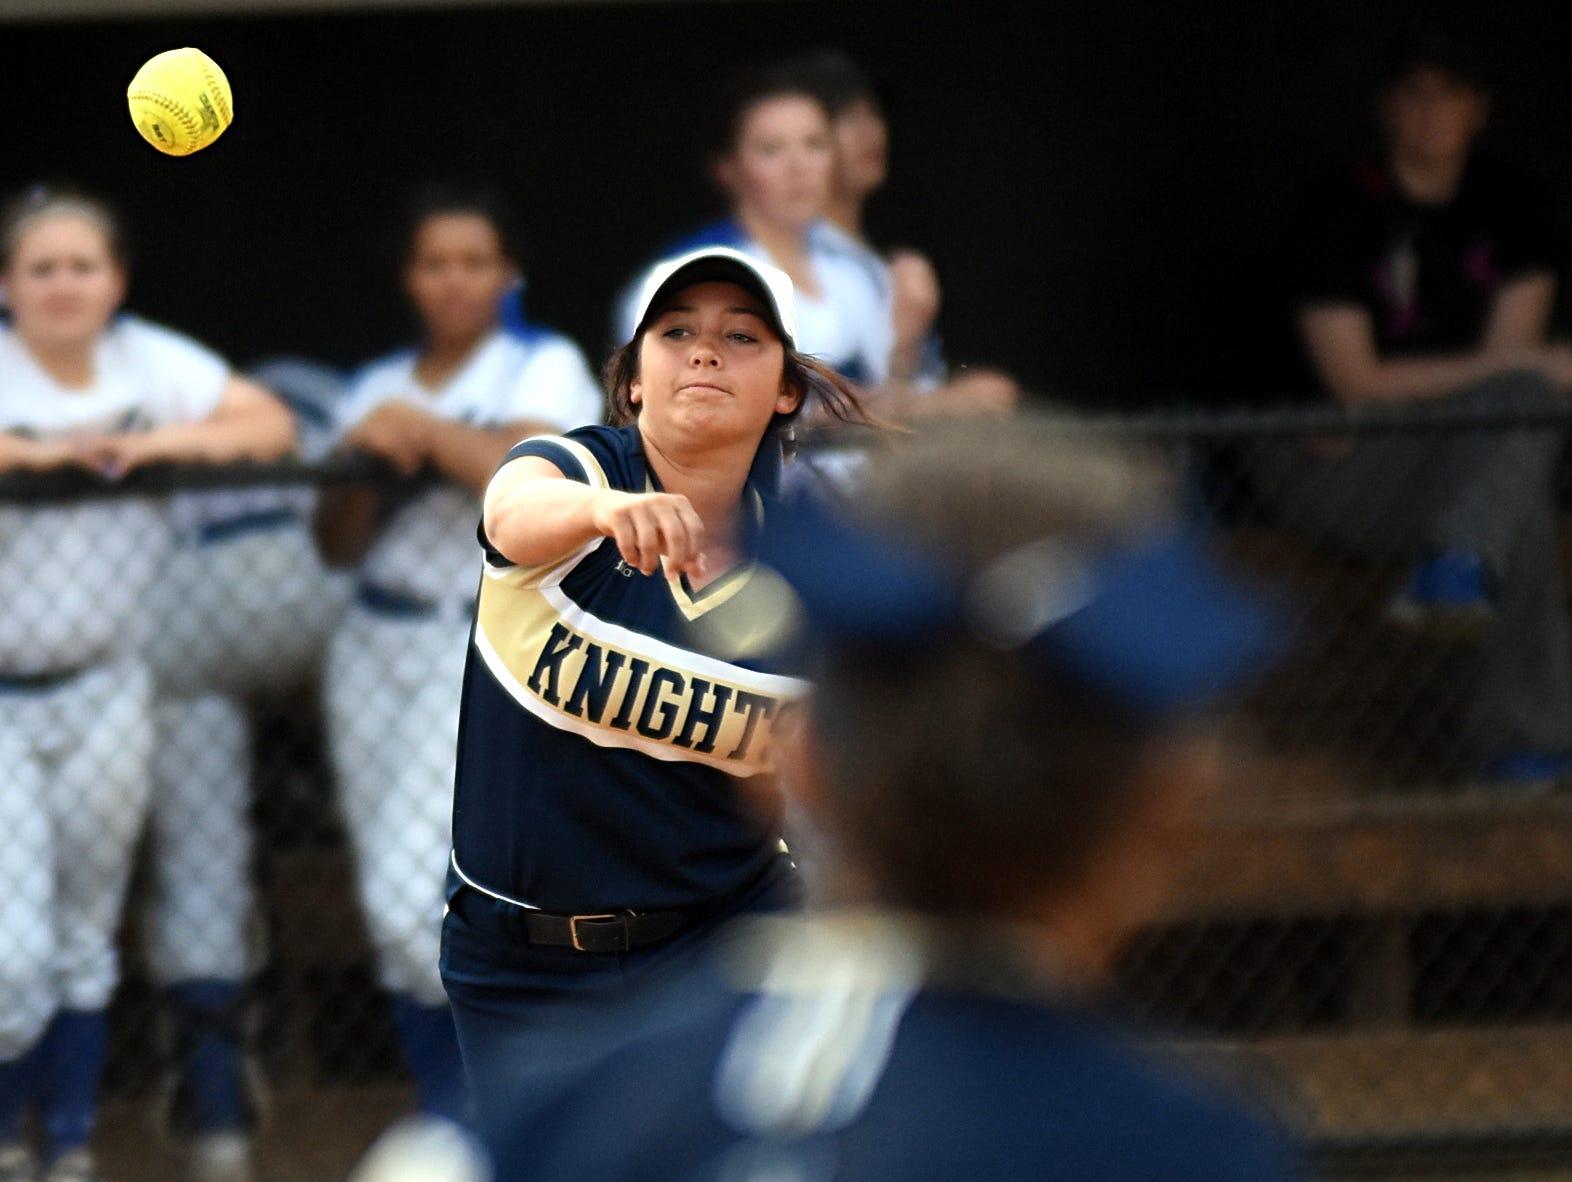 Pope John Paul II High senior Savannah Brown throws to senior second baseman Amanda Kuban at first base for a first-inning putout.